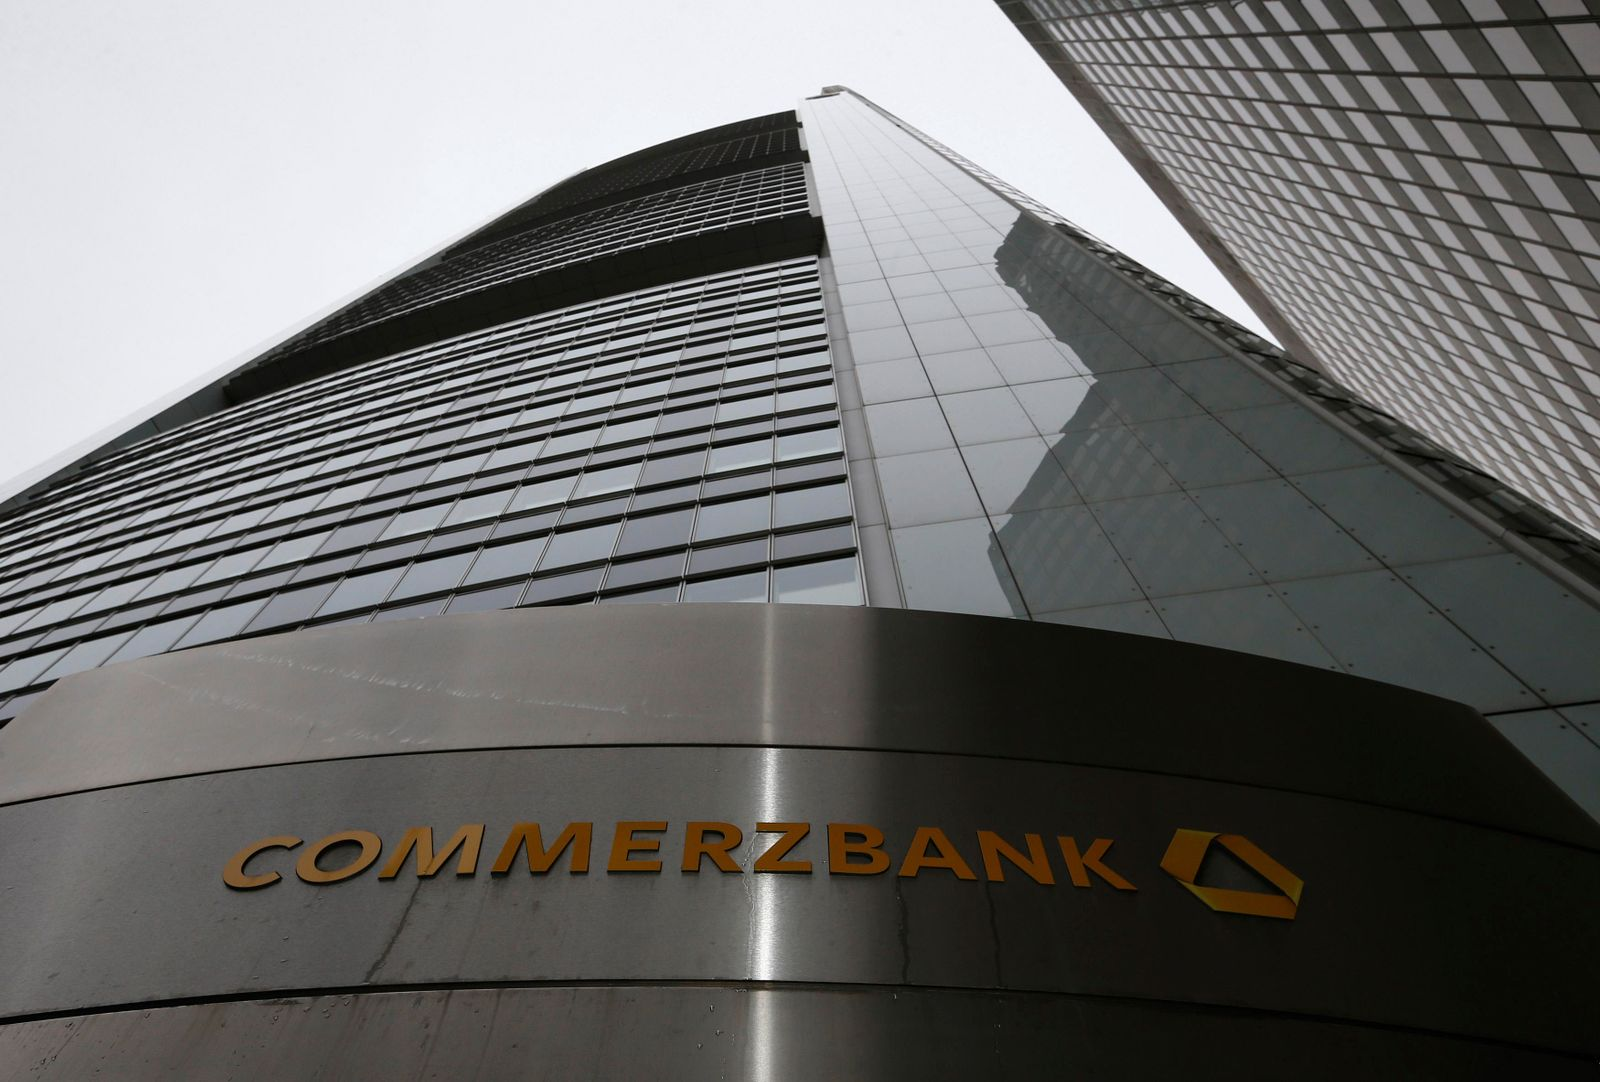 Commerzbank / Ehemalige Skandalbanken